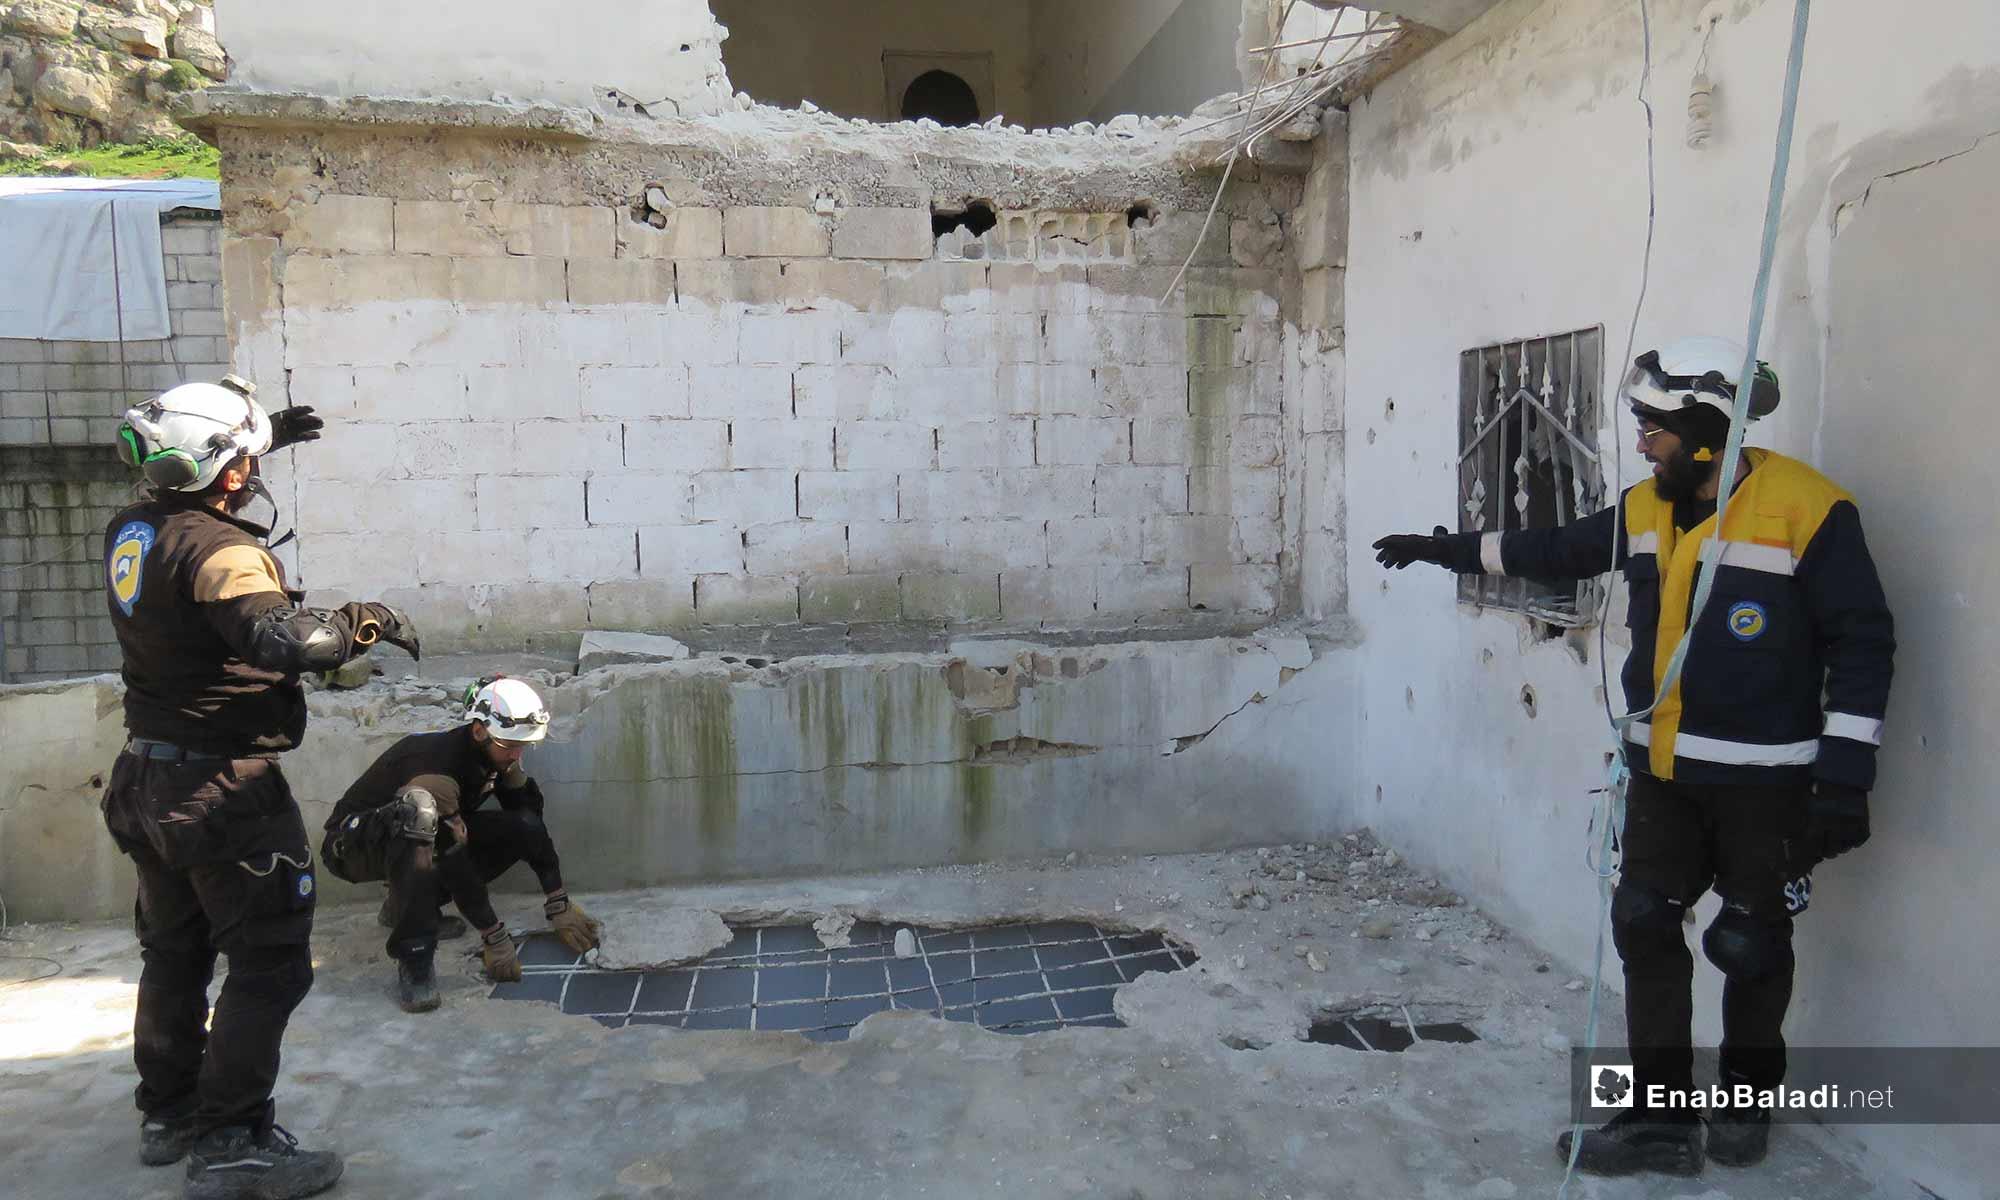 The destruction caused by the shelling of Qalaat al-Madiq, rural Hama - February 18, 2019 (Enab Baladi)